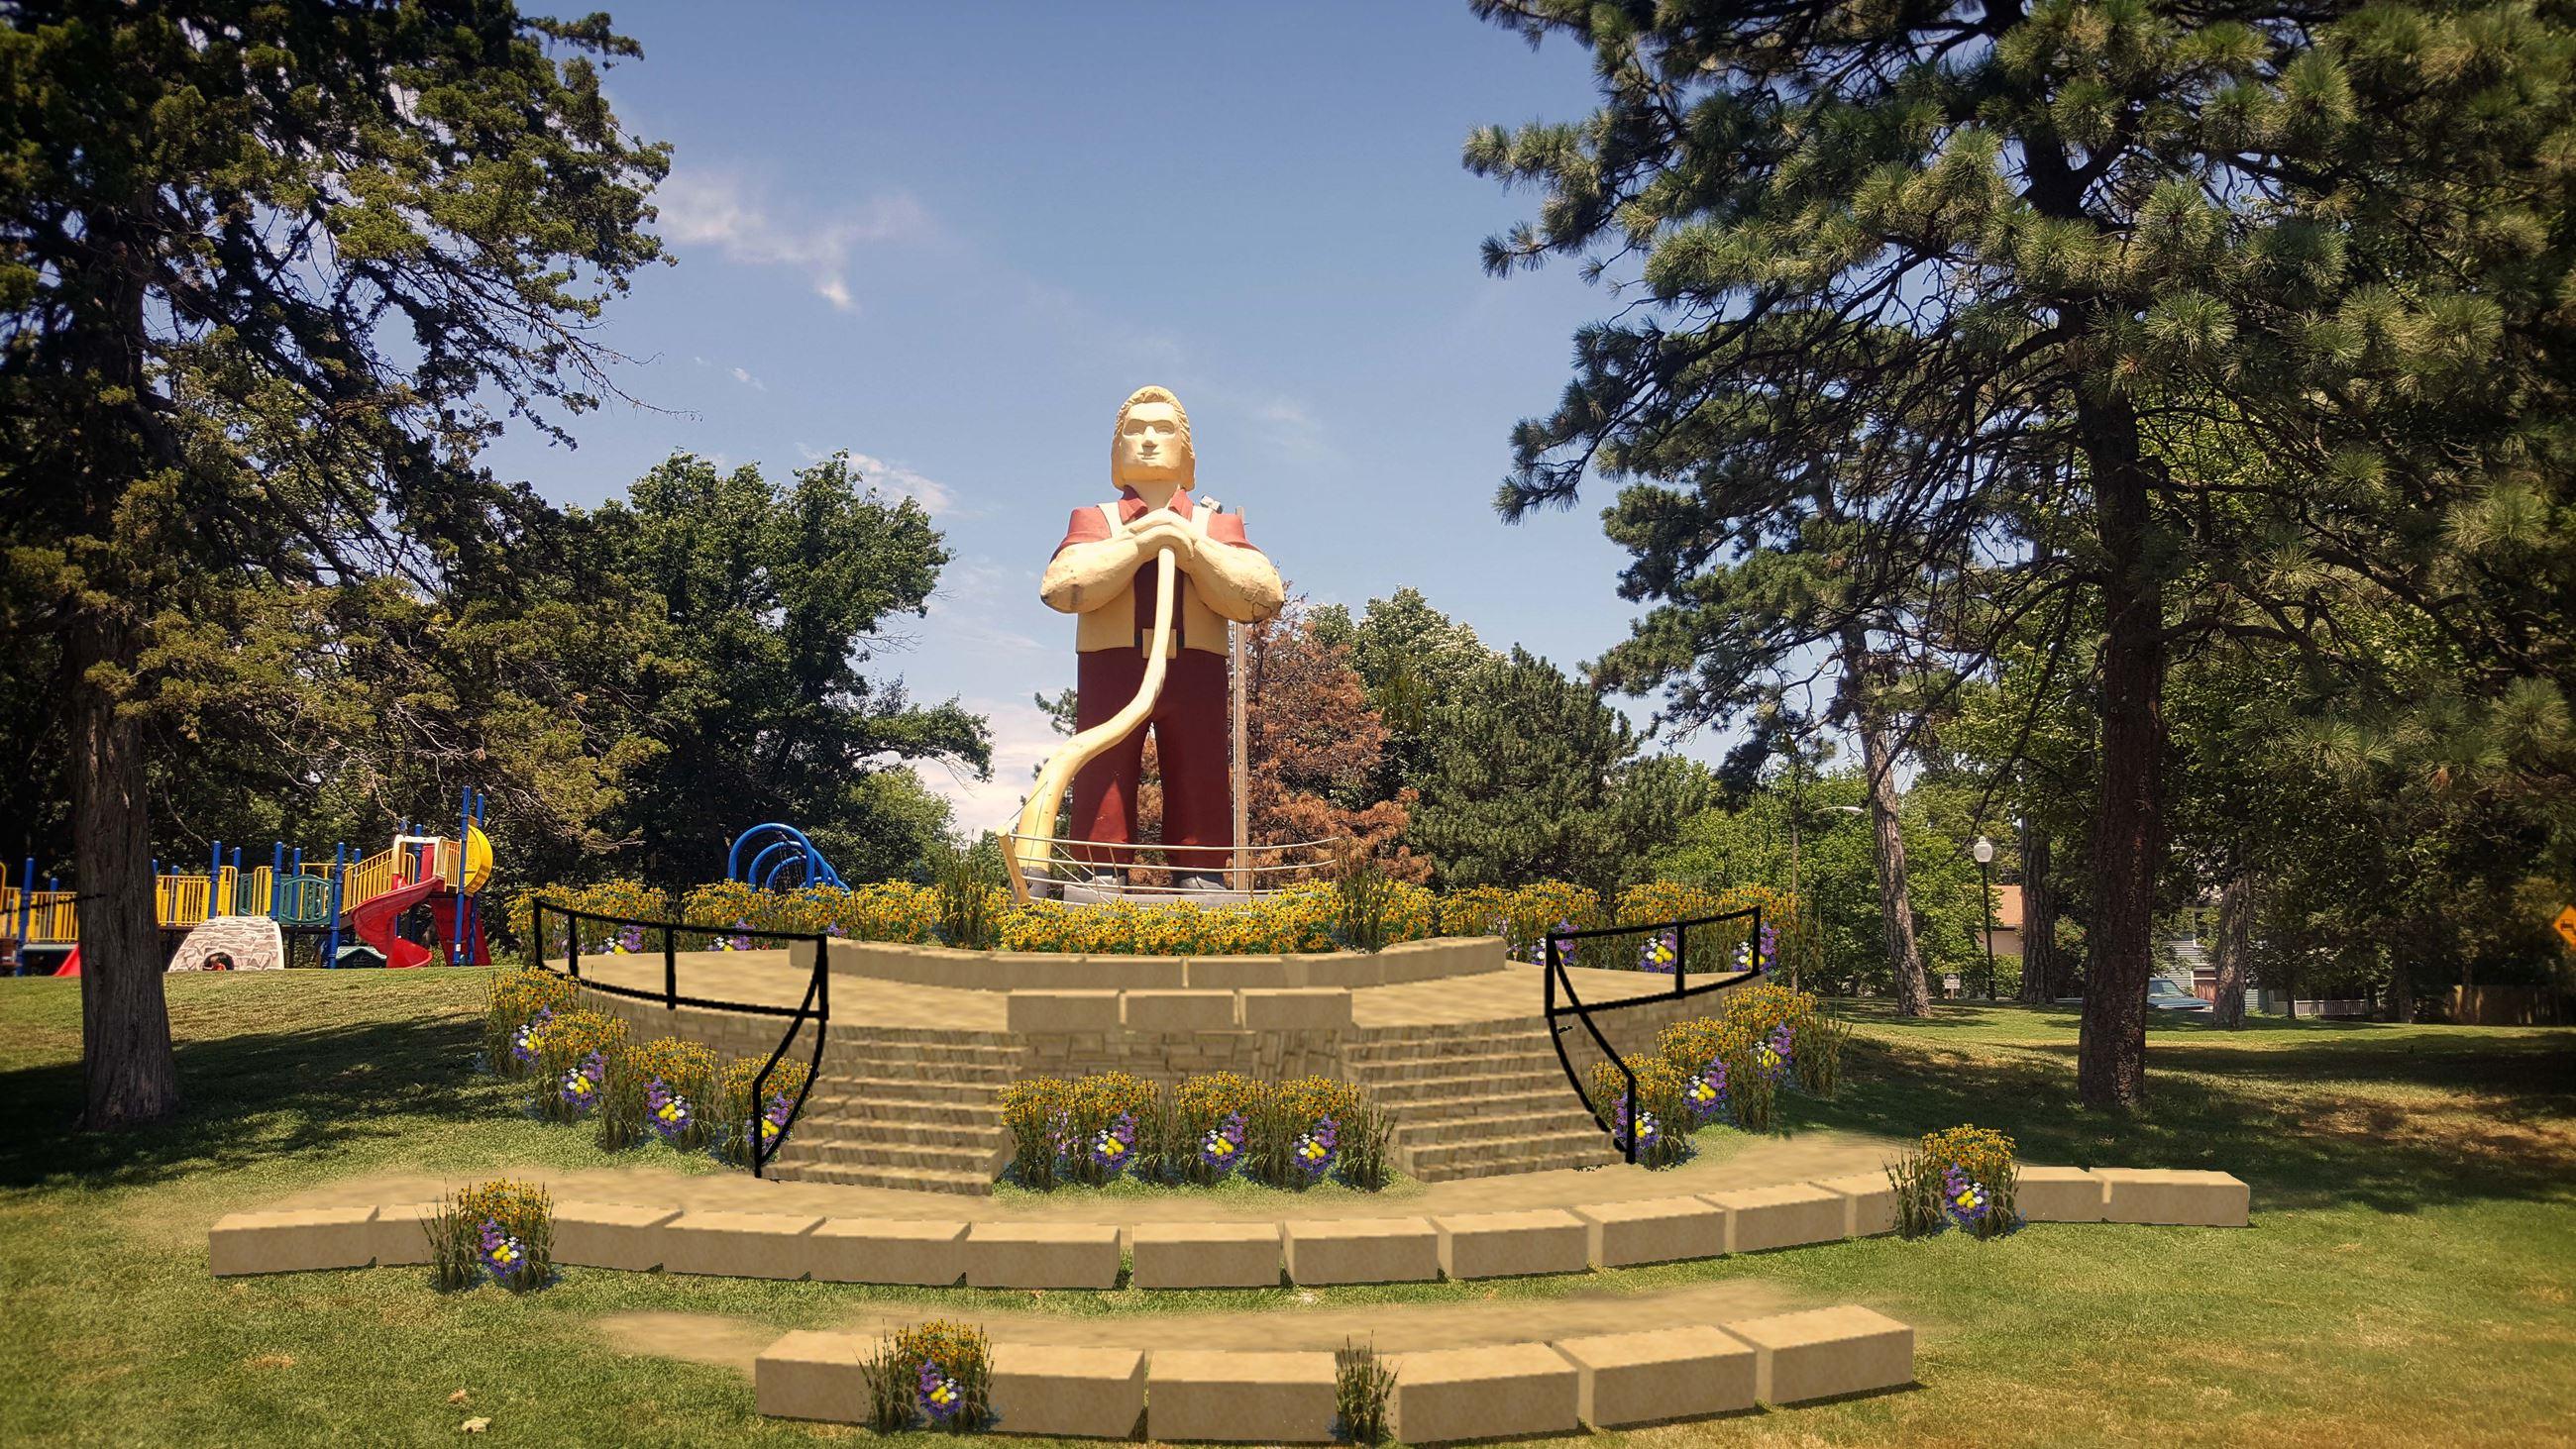 Johnny Kaw Statue | Manhattan Parks and Rec, KS